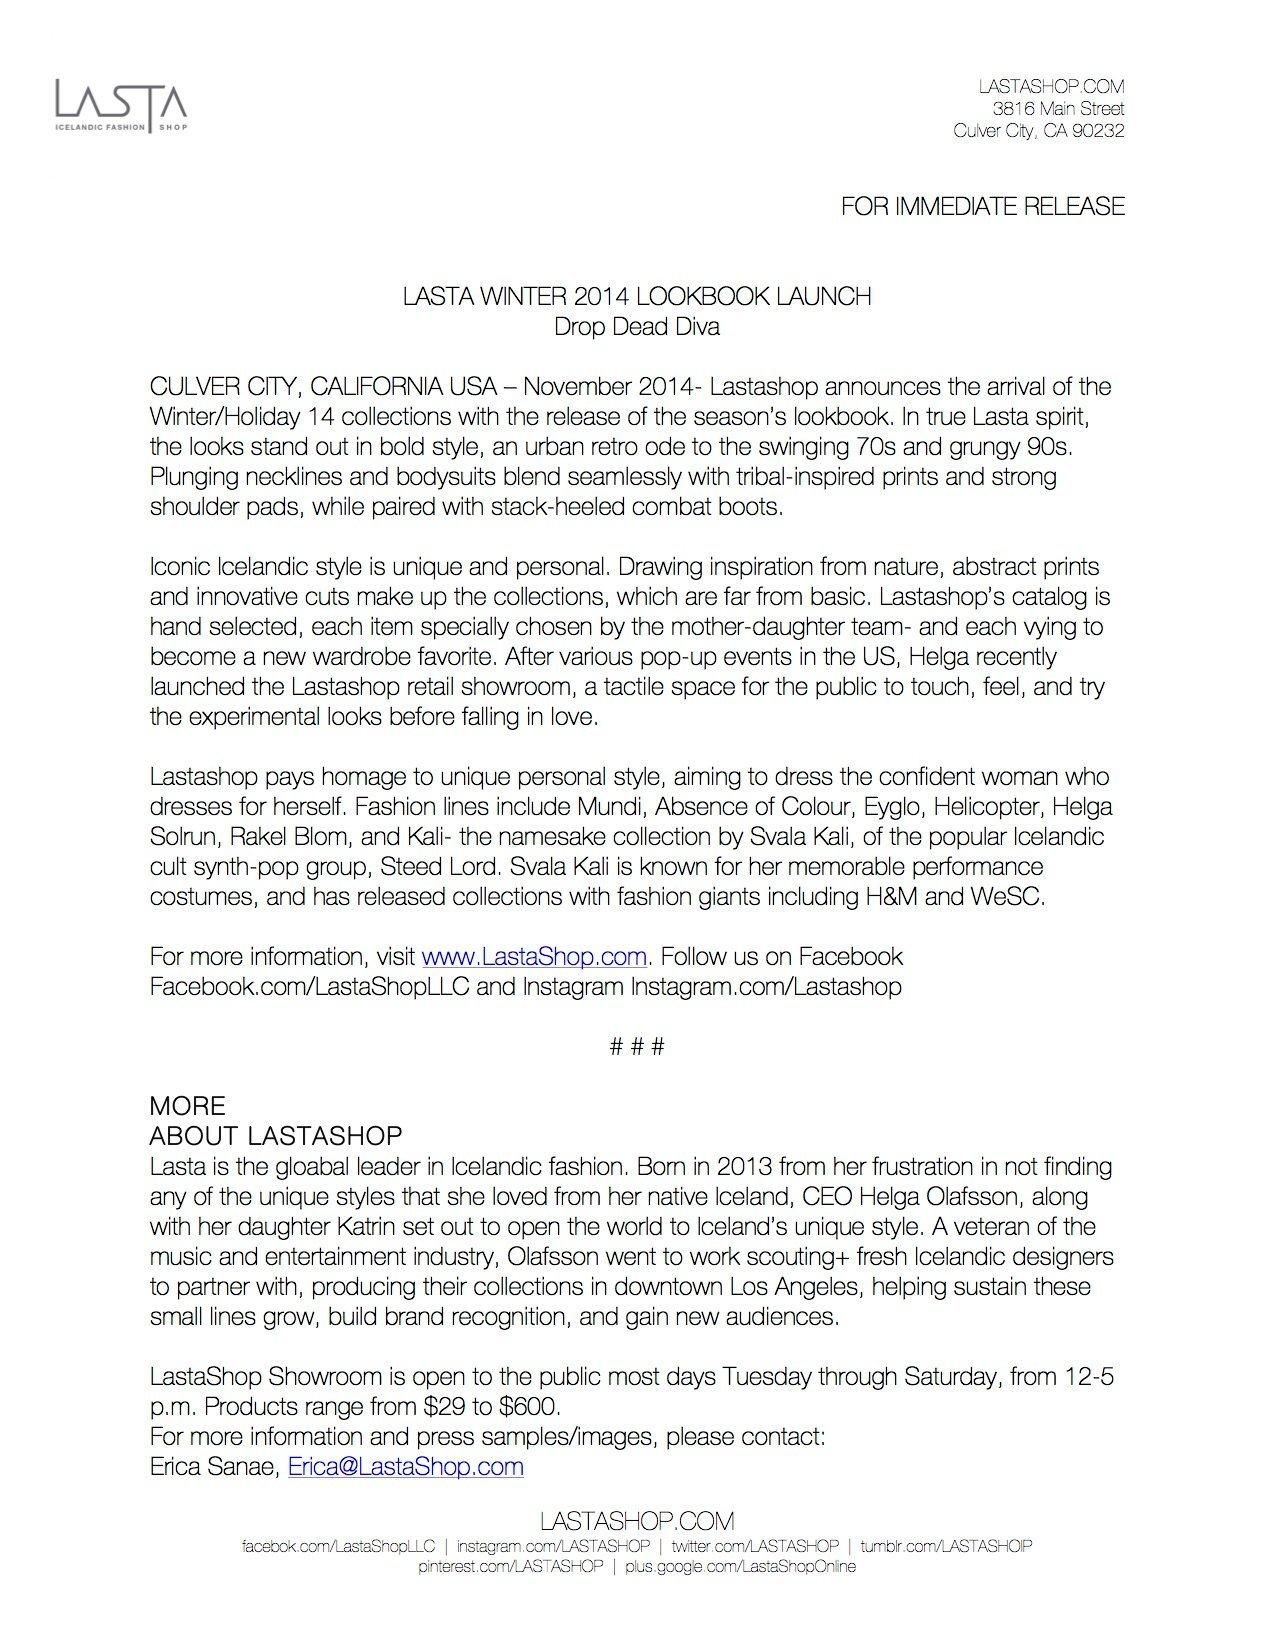 LASTASHOP Press Release